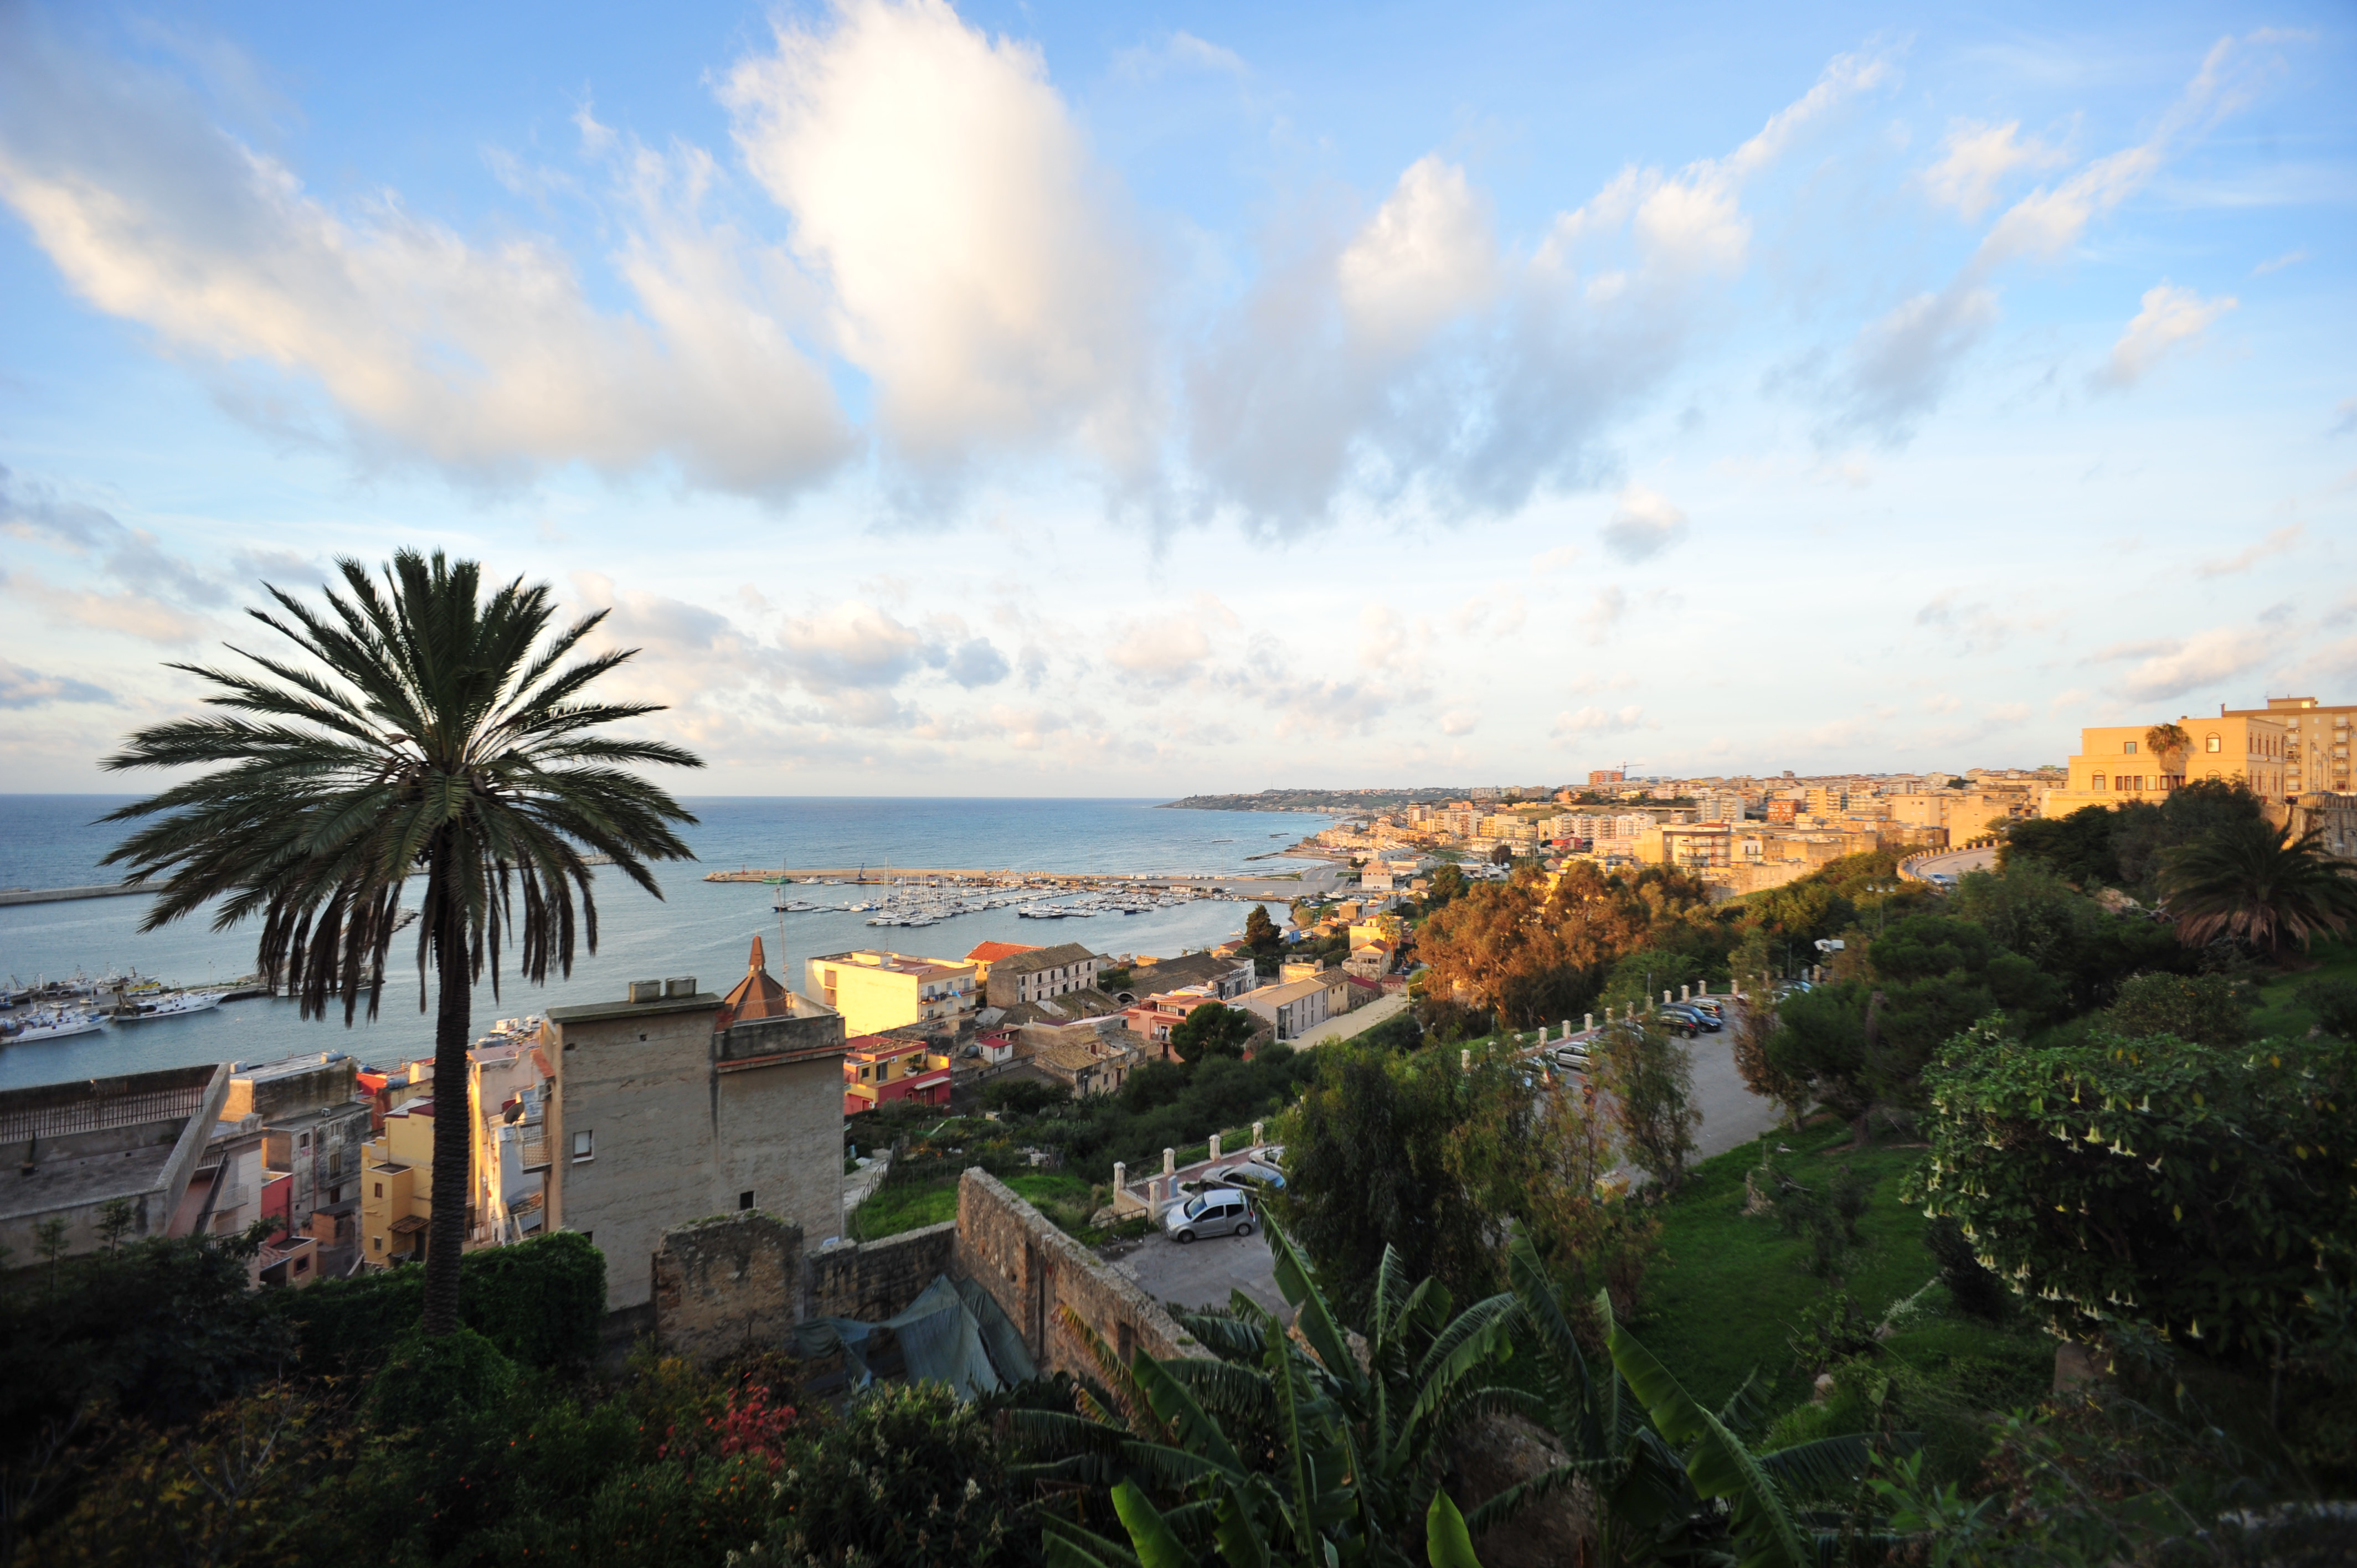 A Sciacca l'incompiuta più antica d'Italia